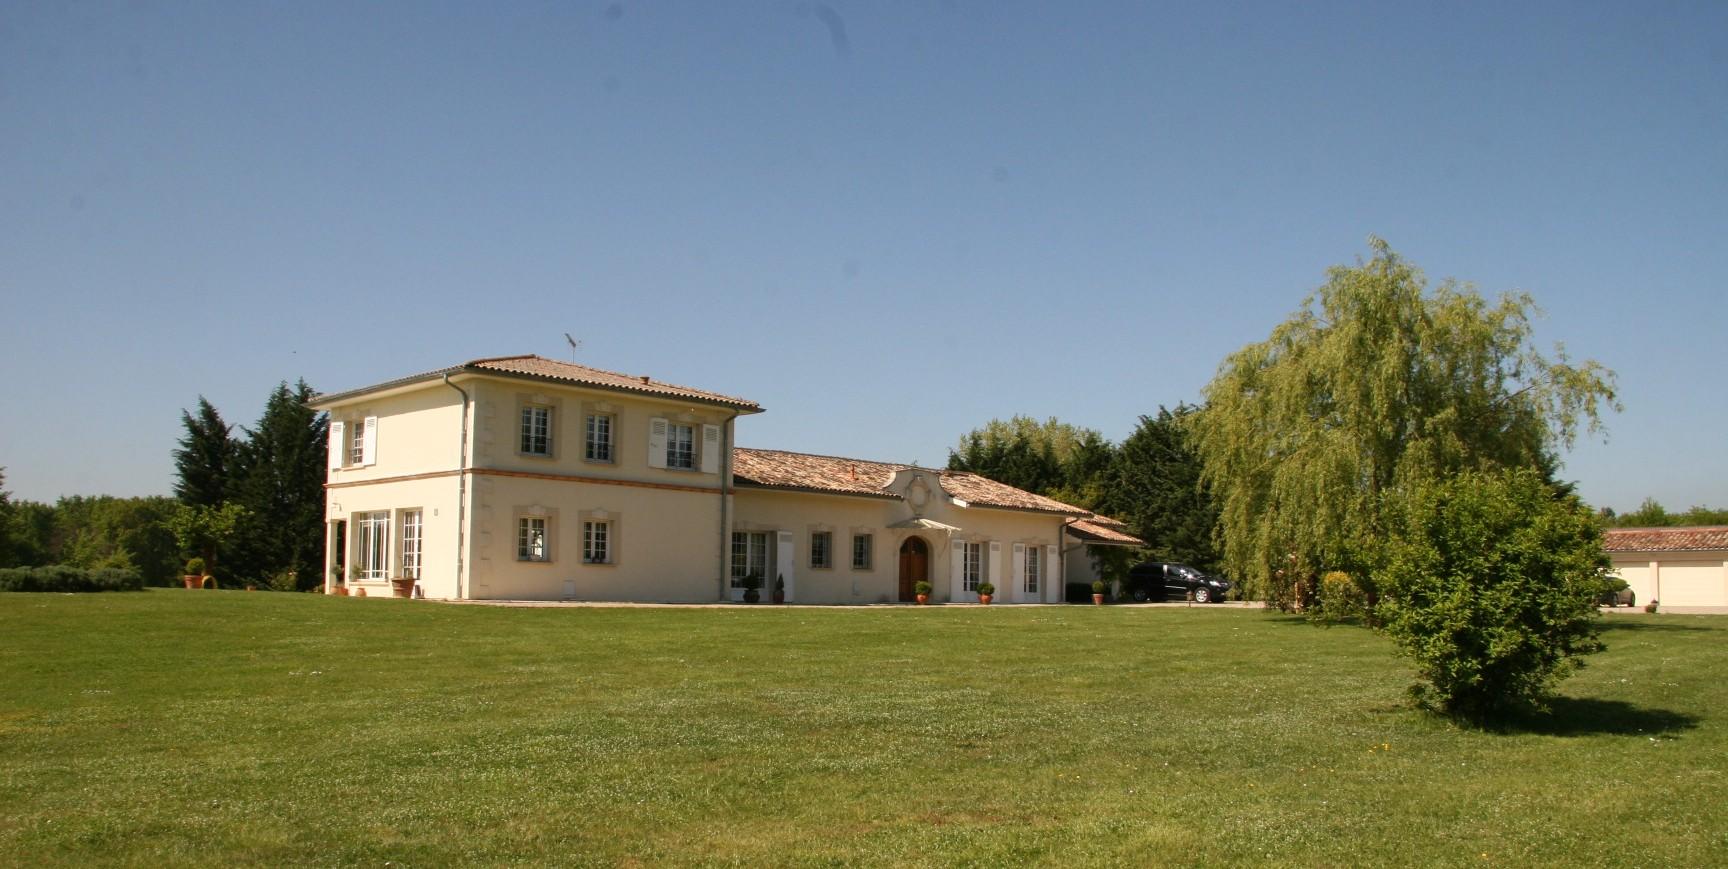 Moradia para Venda às Magnificent 20 hectare property around Bordeaux Cestas, Aquitaine 33610 França